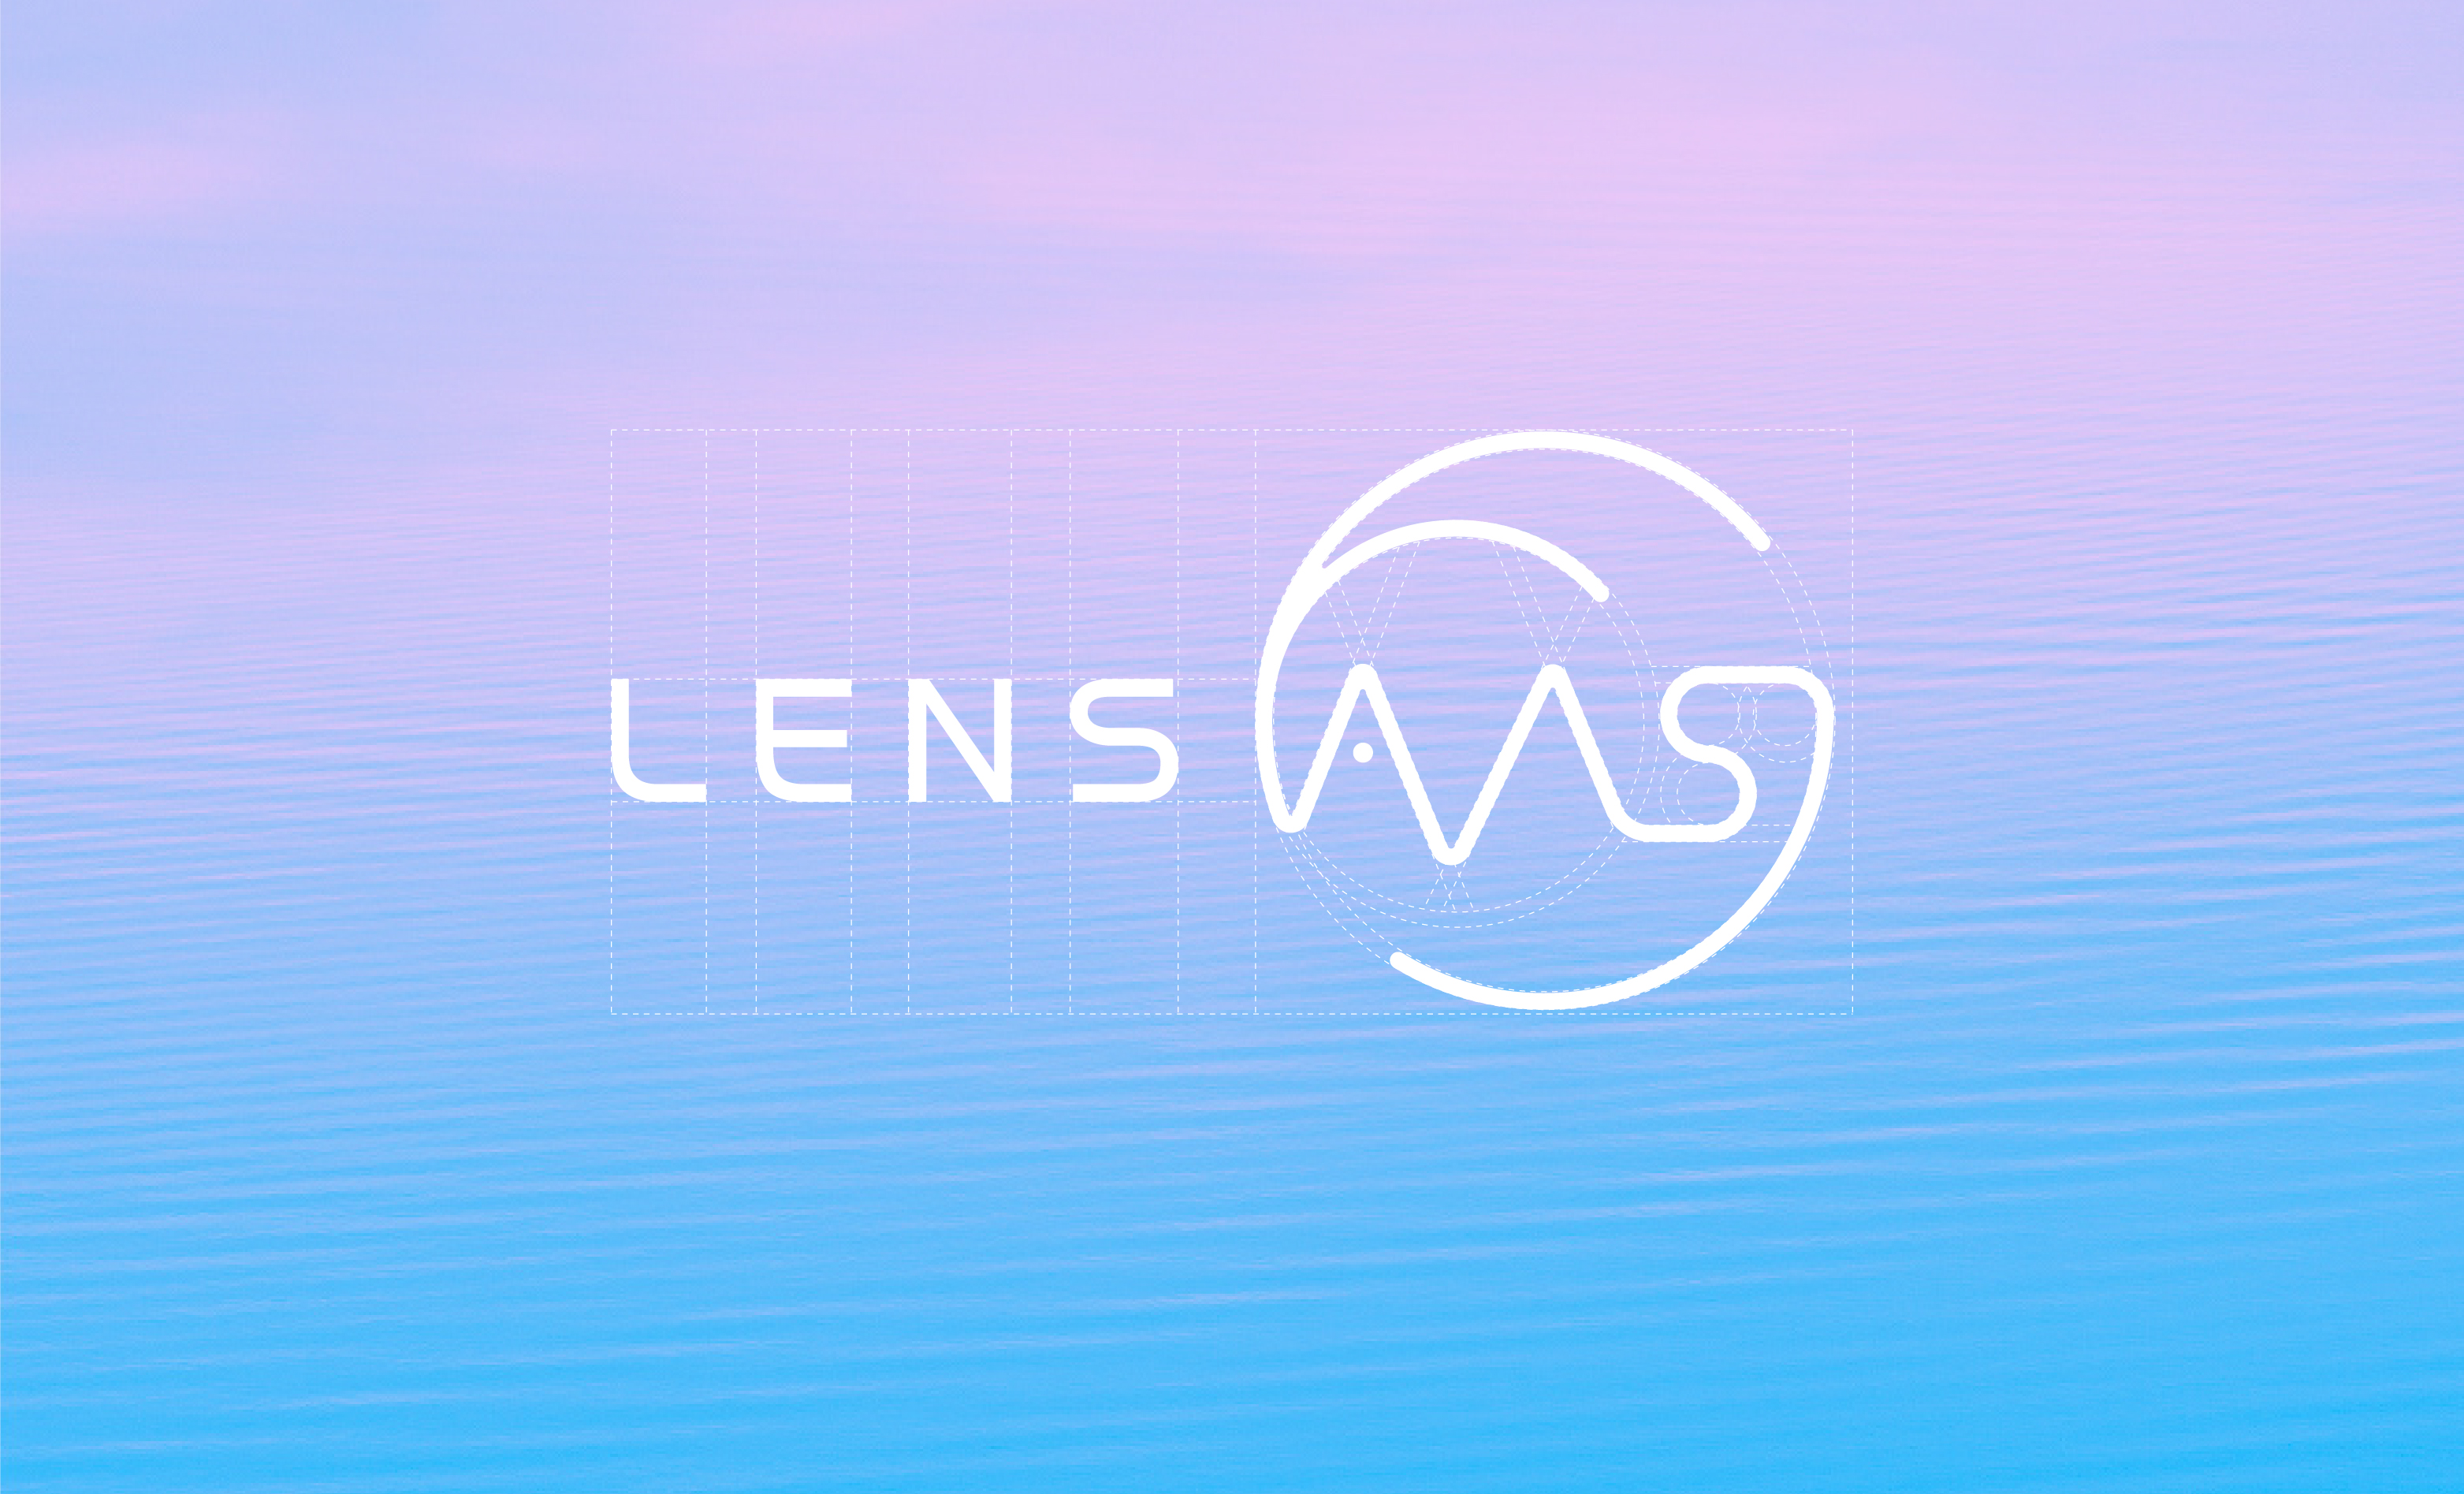 lensfans logo